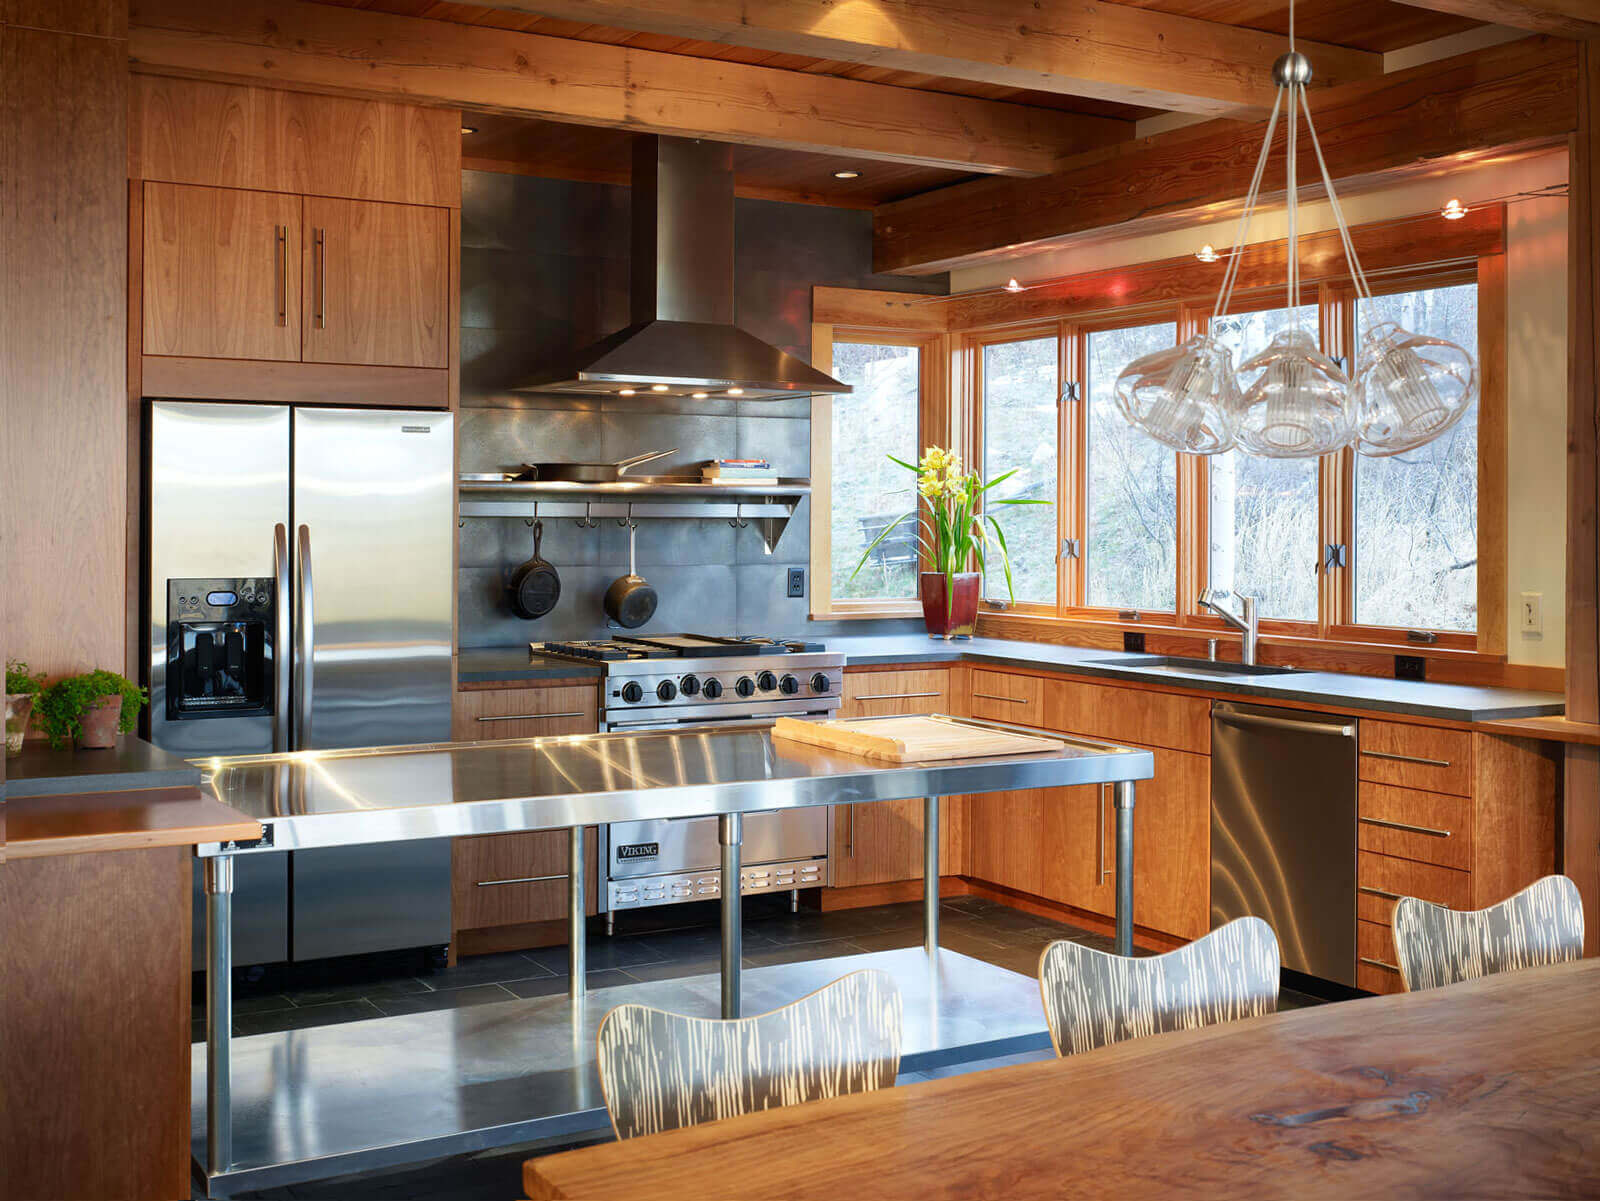 Kitchen Island Stainless Steel Top